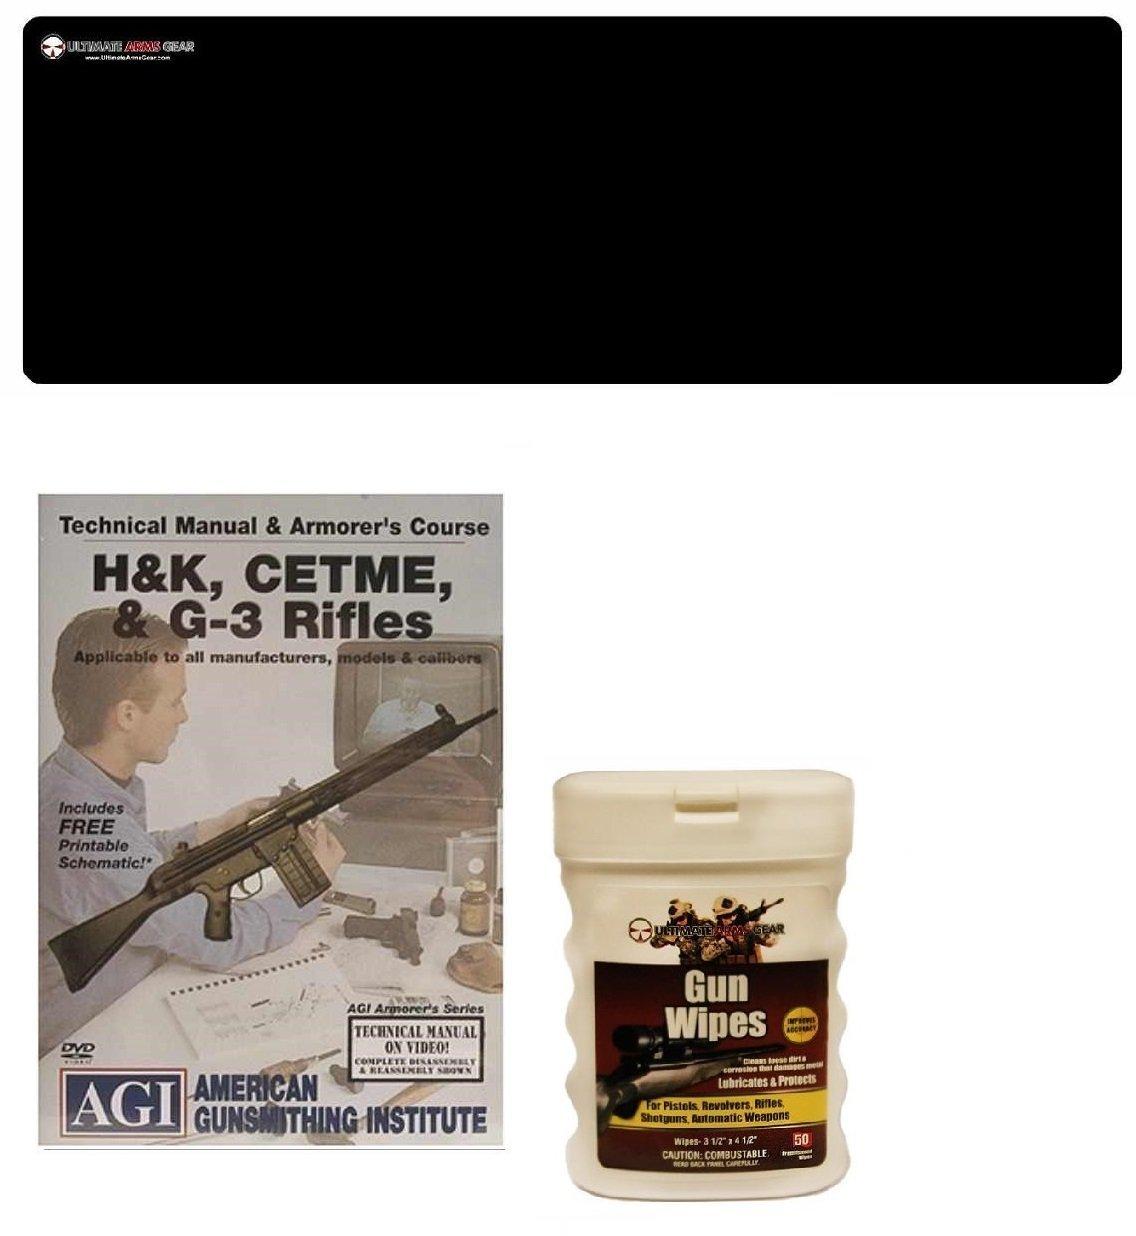 AGI DVD Manual & Armorer's Course HK H&K 91 93 94 MP5 MP-5, CETME & G-3 G3 Rifles + Ultimate Arms Gear Gunsmith & Armorer's Cleaning Bench Gun Mat + Gun Wipes